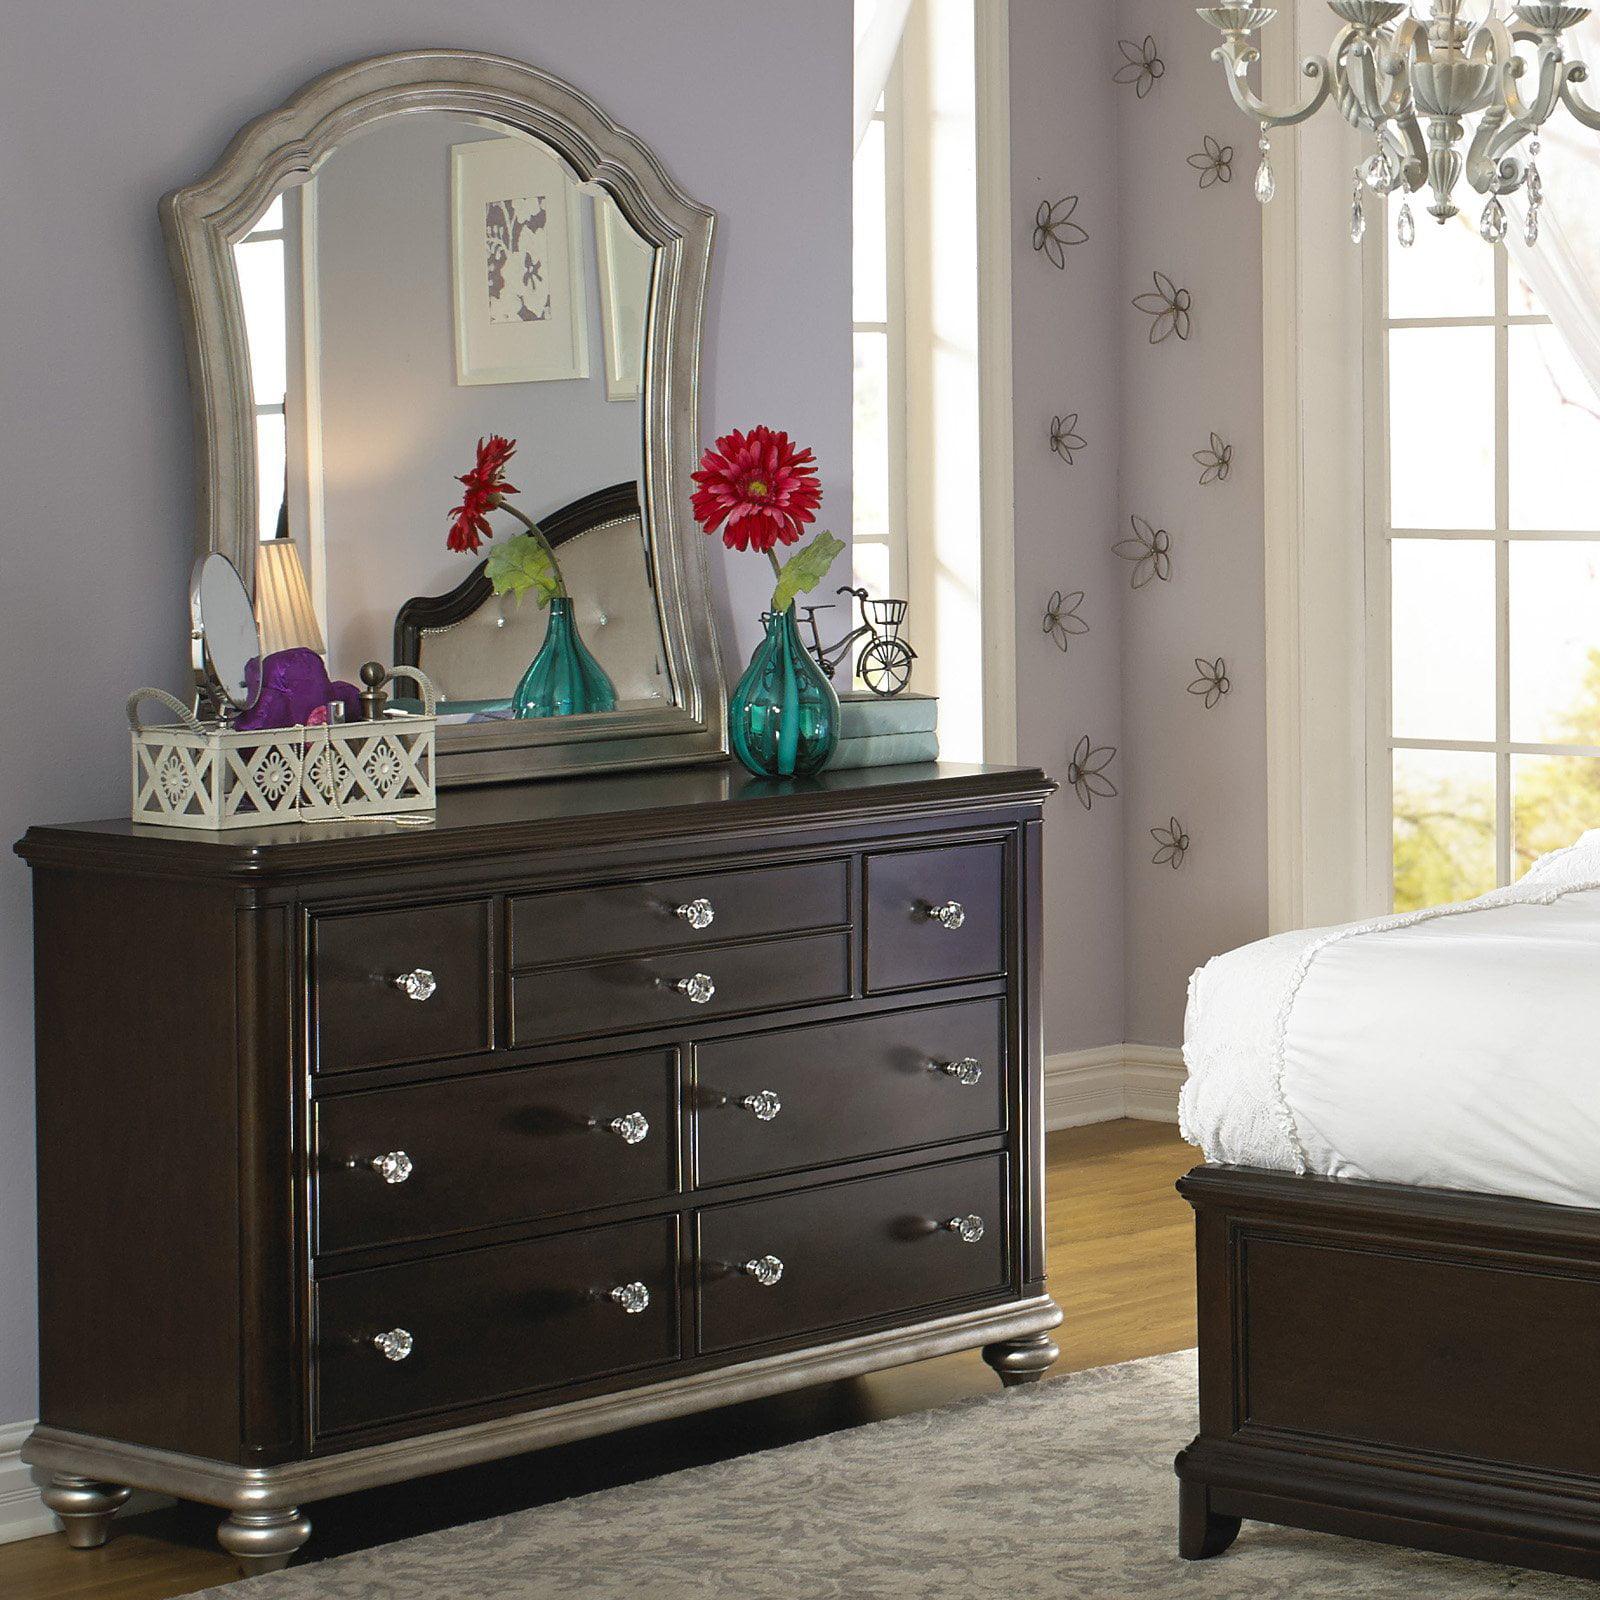 Girls Glam 7 Drawer Dresser Dark Cherry by Home Meridian International Inc